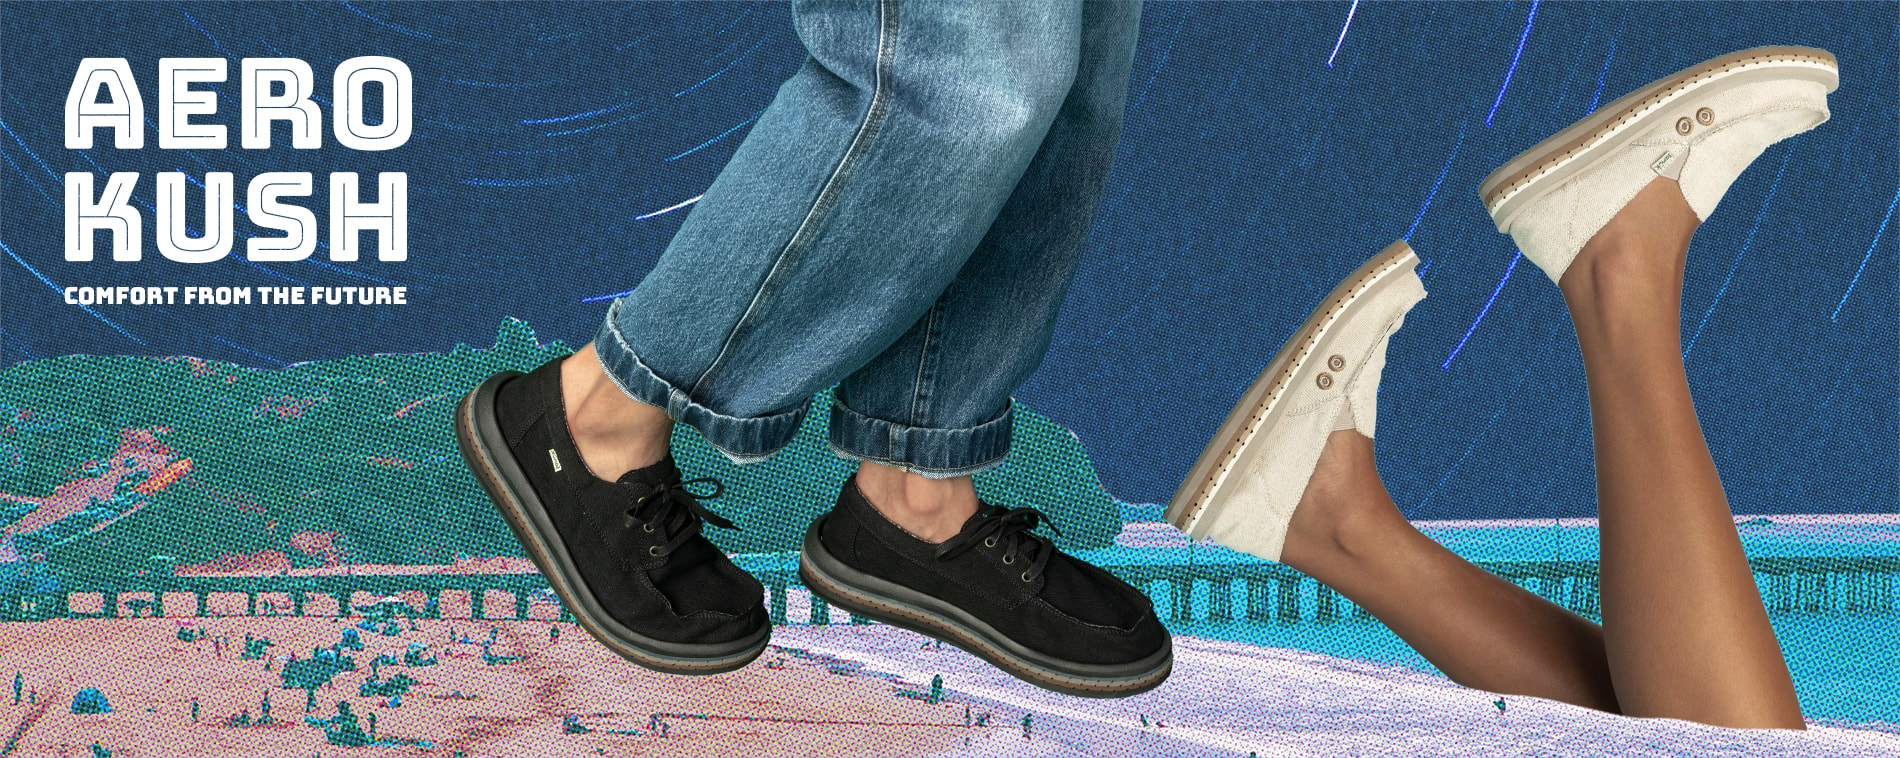 The AeroKush shoes from Sanuk.